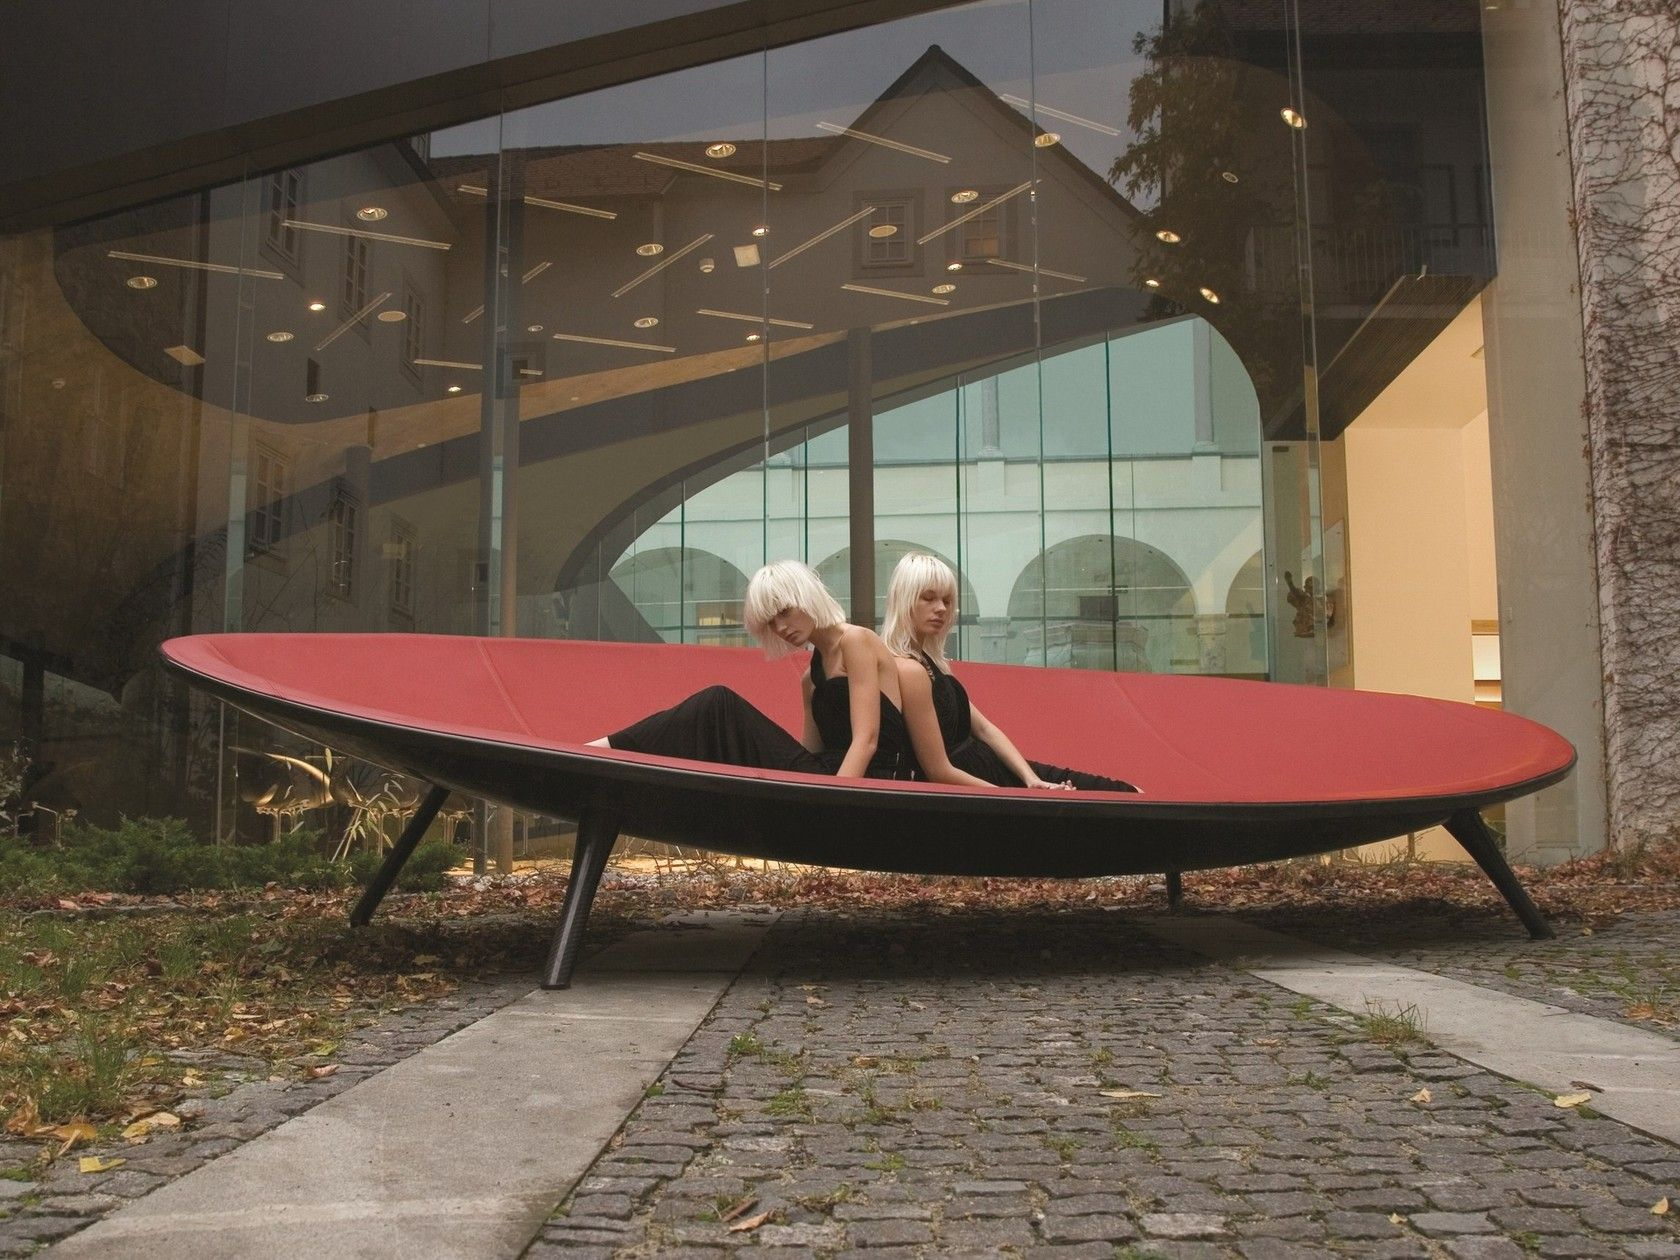 ICFF 2019 Tokio's Contemporary Avant-garde Furniture Designs - Isle Lounge - - icff ICFF 2019: Tokio's Contemporary Avant-garde Furniture Designs ICFF 2019 Tokios Contemporary Avant garde Furniture Designs Isle Lounge 1 1